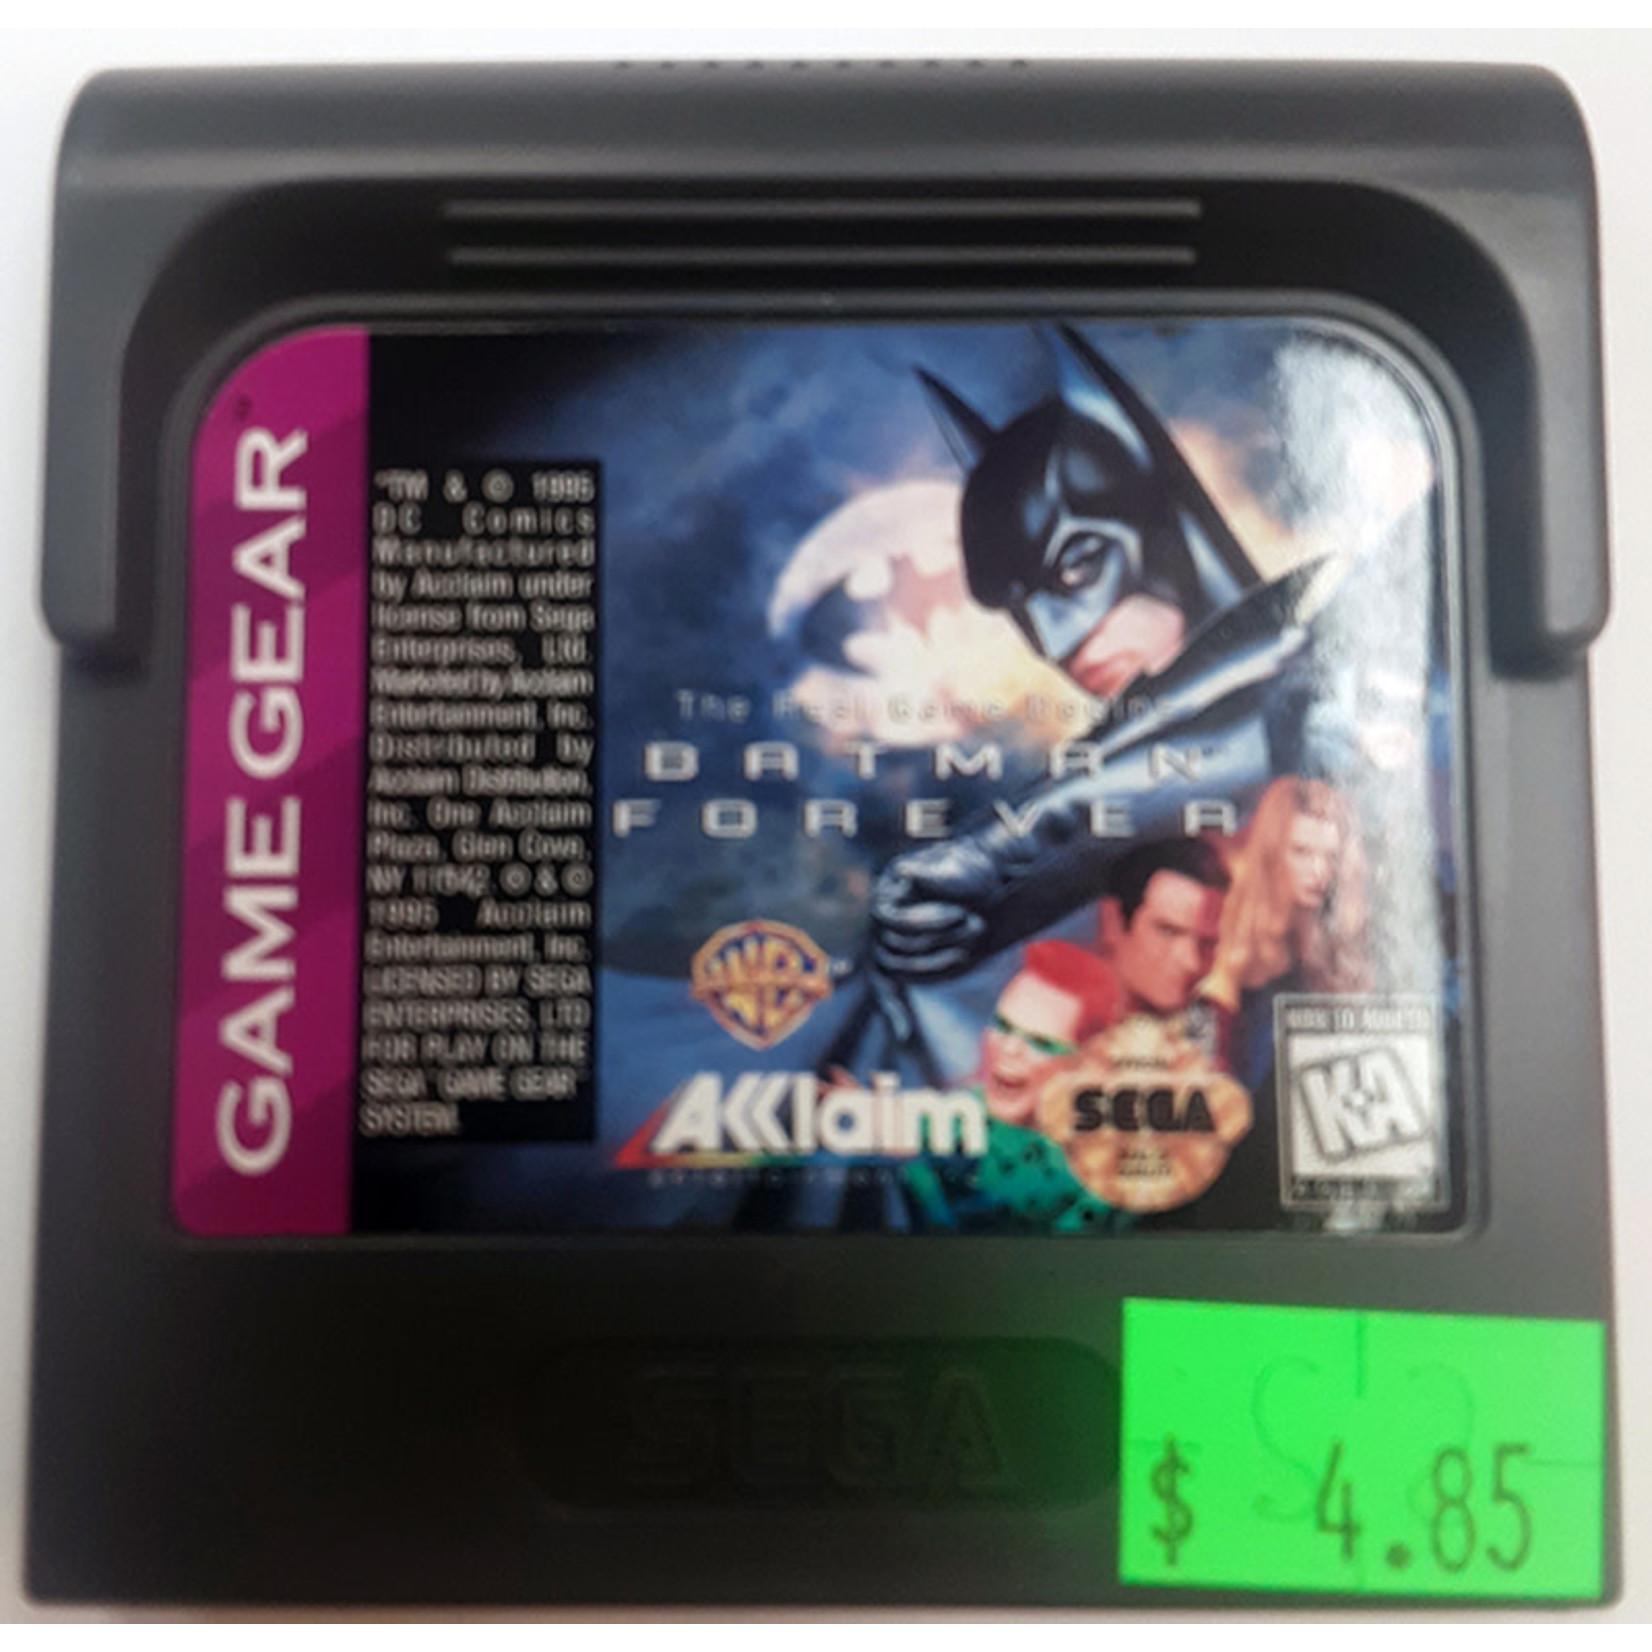 GGu-Batman Forever